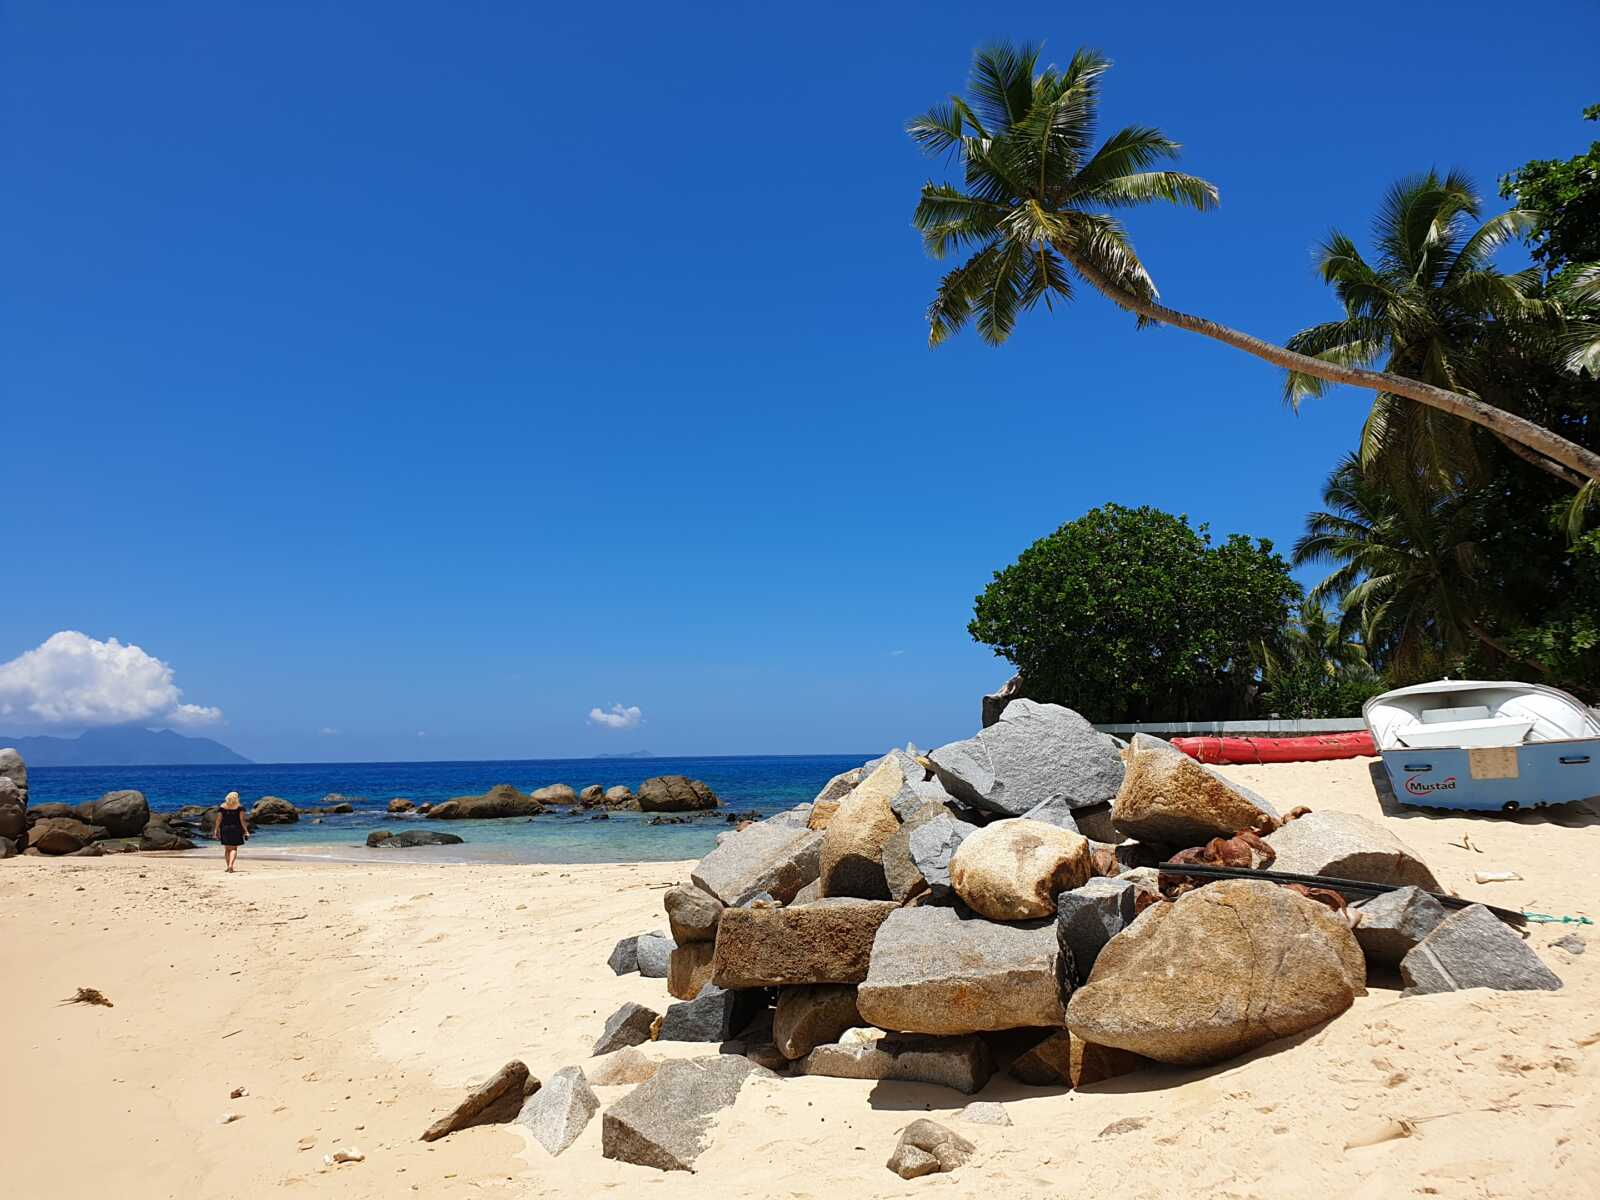 Sejšeli, plaža, palma, putovanja